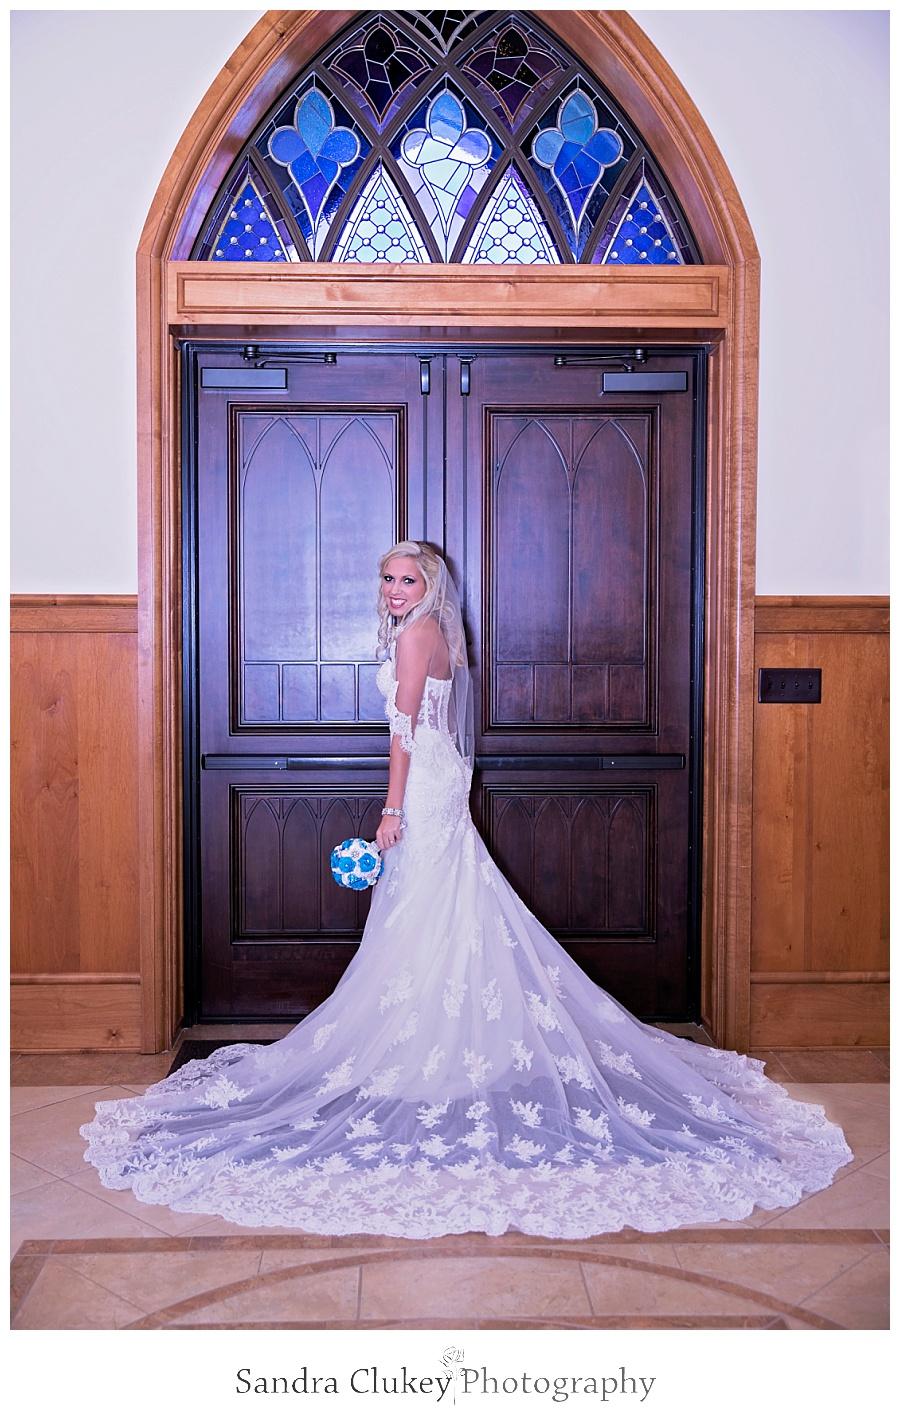 Bride stands at church doors